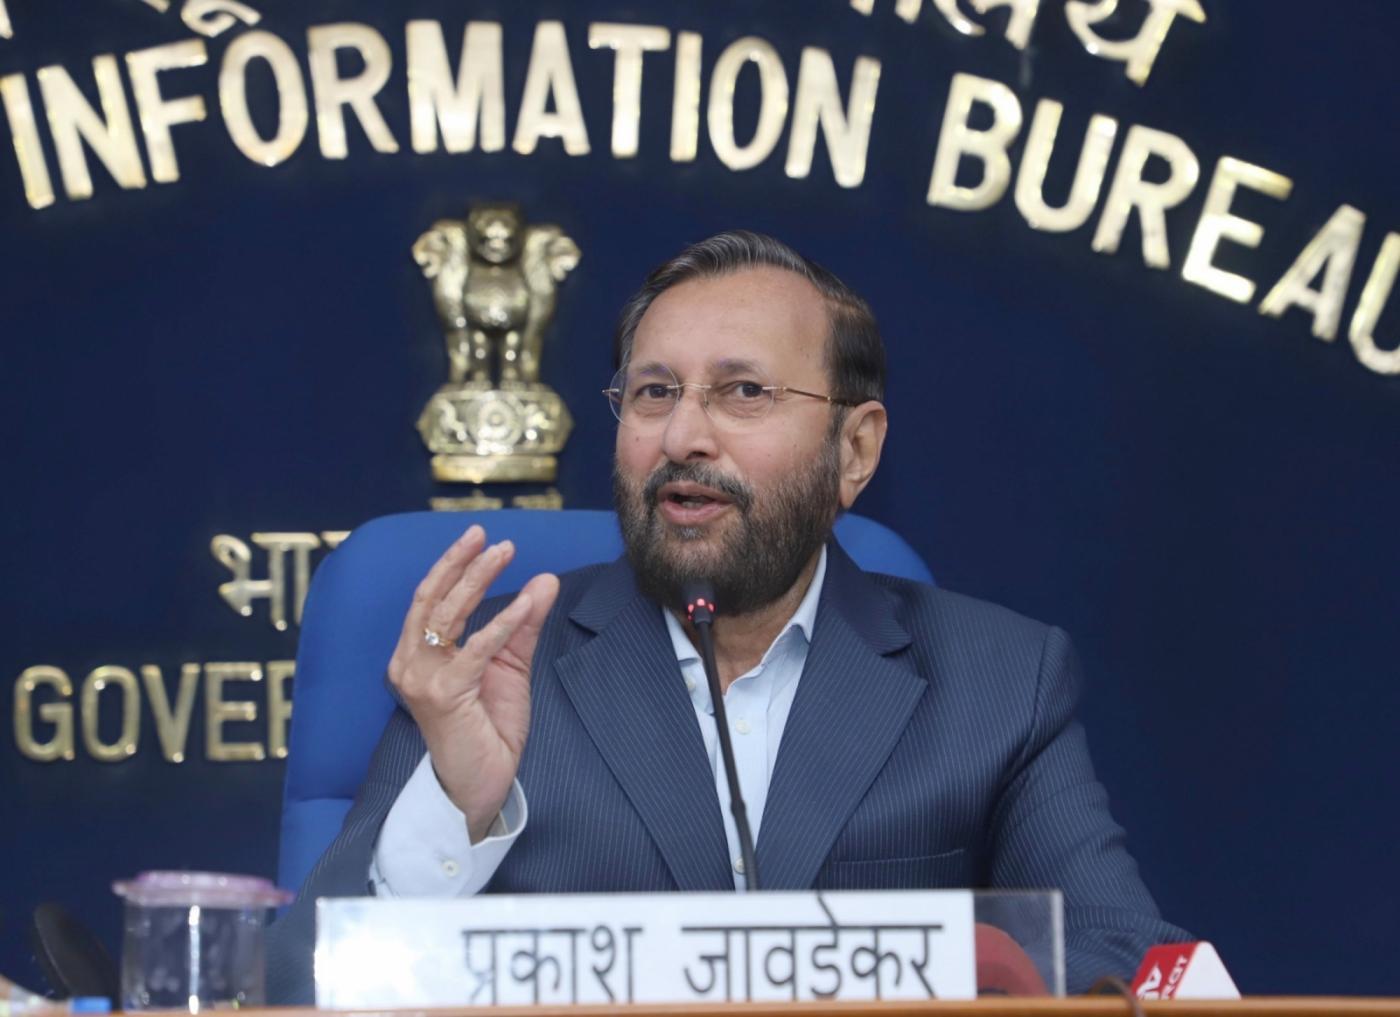 New Delhi: Union Human Resource Development Minister Prakash Javadekar addresses a press conference, in New Delhi, on Feb 20, 2019. (Photo: IANS/PIB) by .